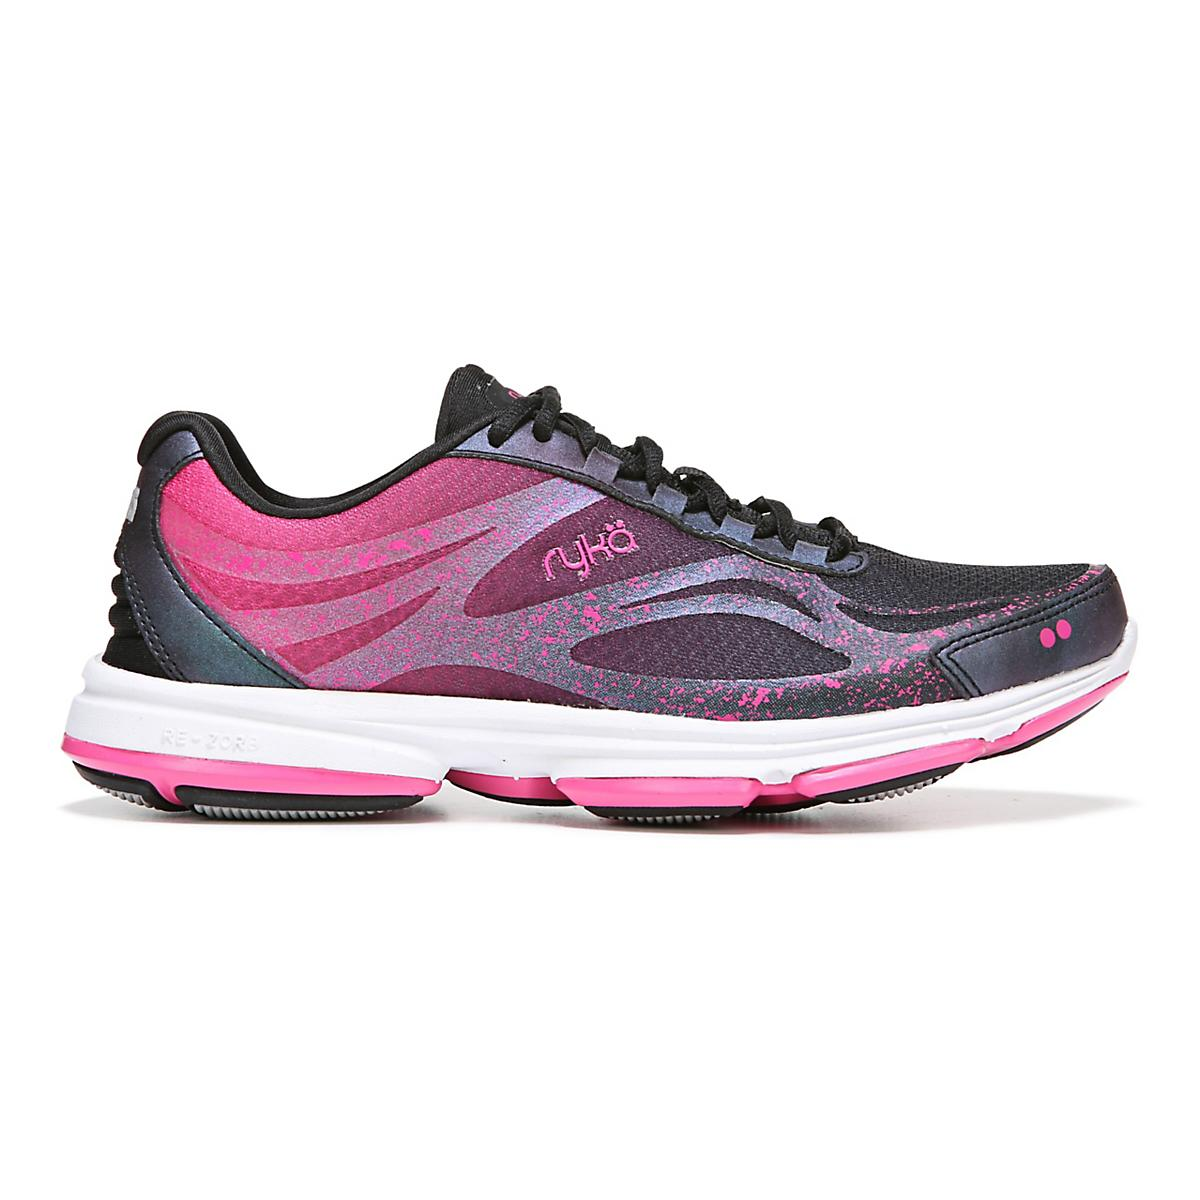 Ryka-Devotion-3-. +80 Most Inspiring Workout Shoes Ideas for Women